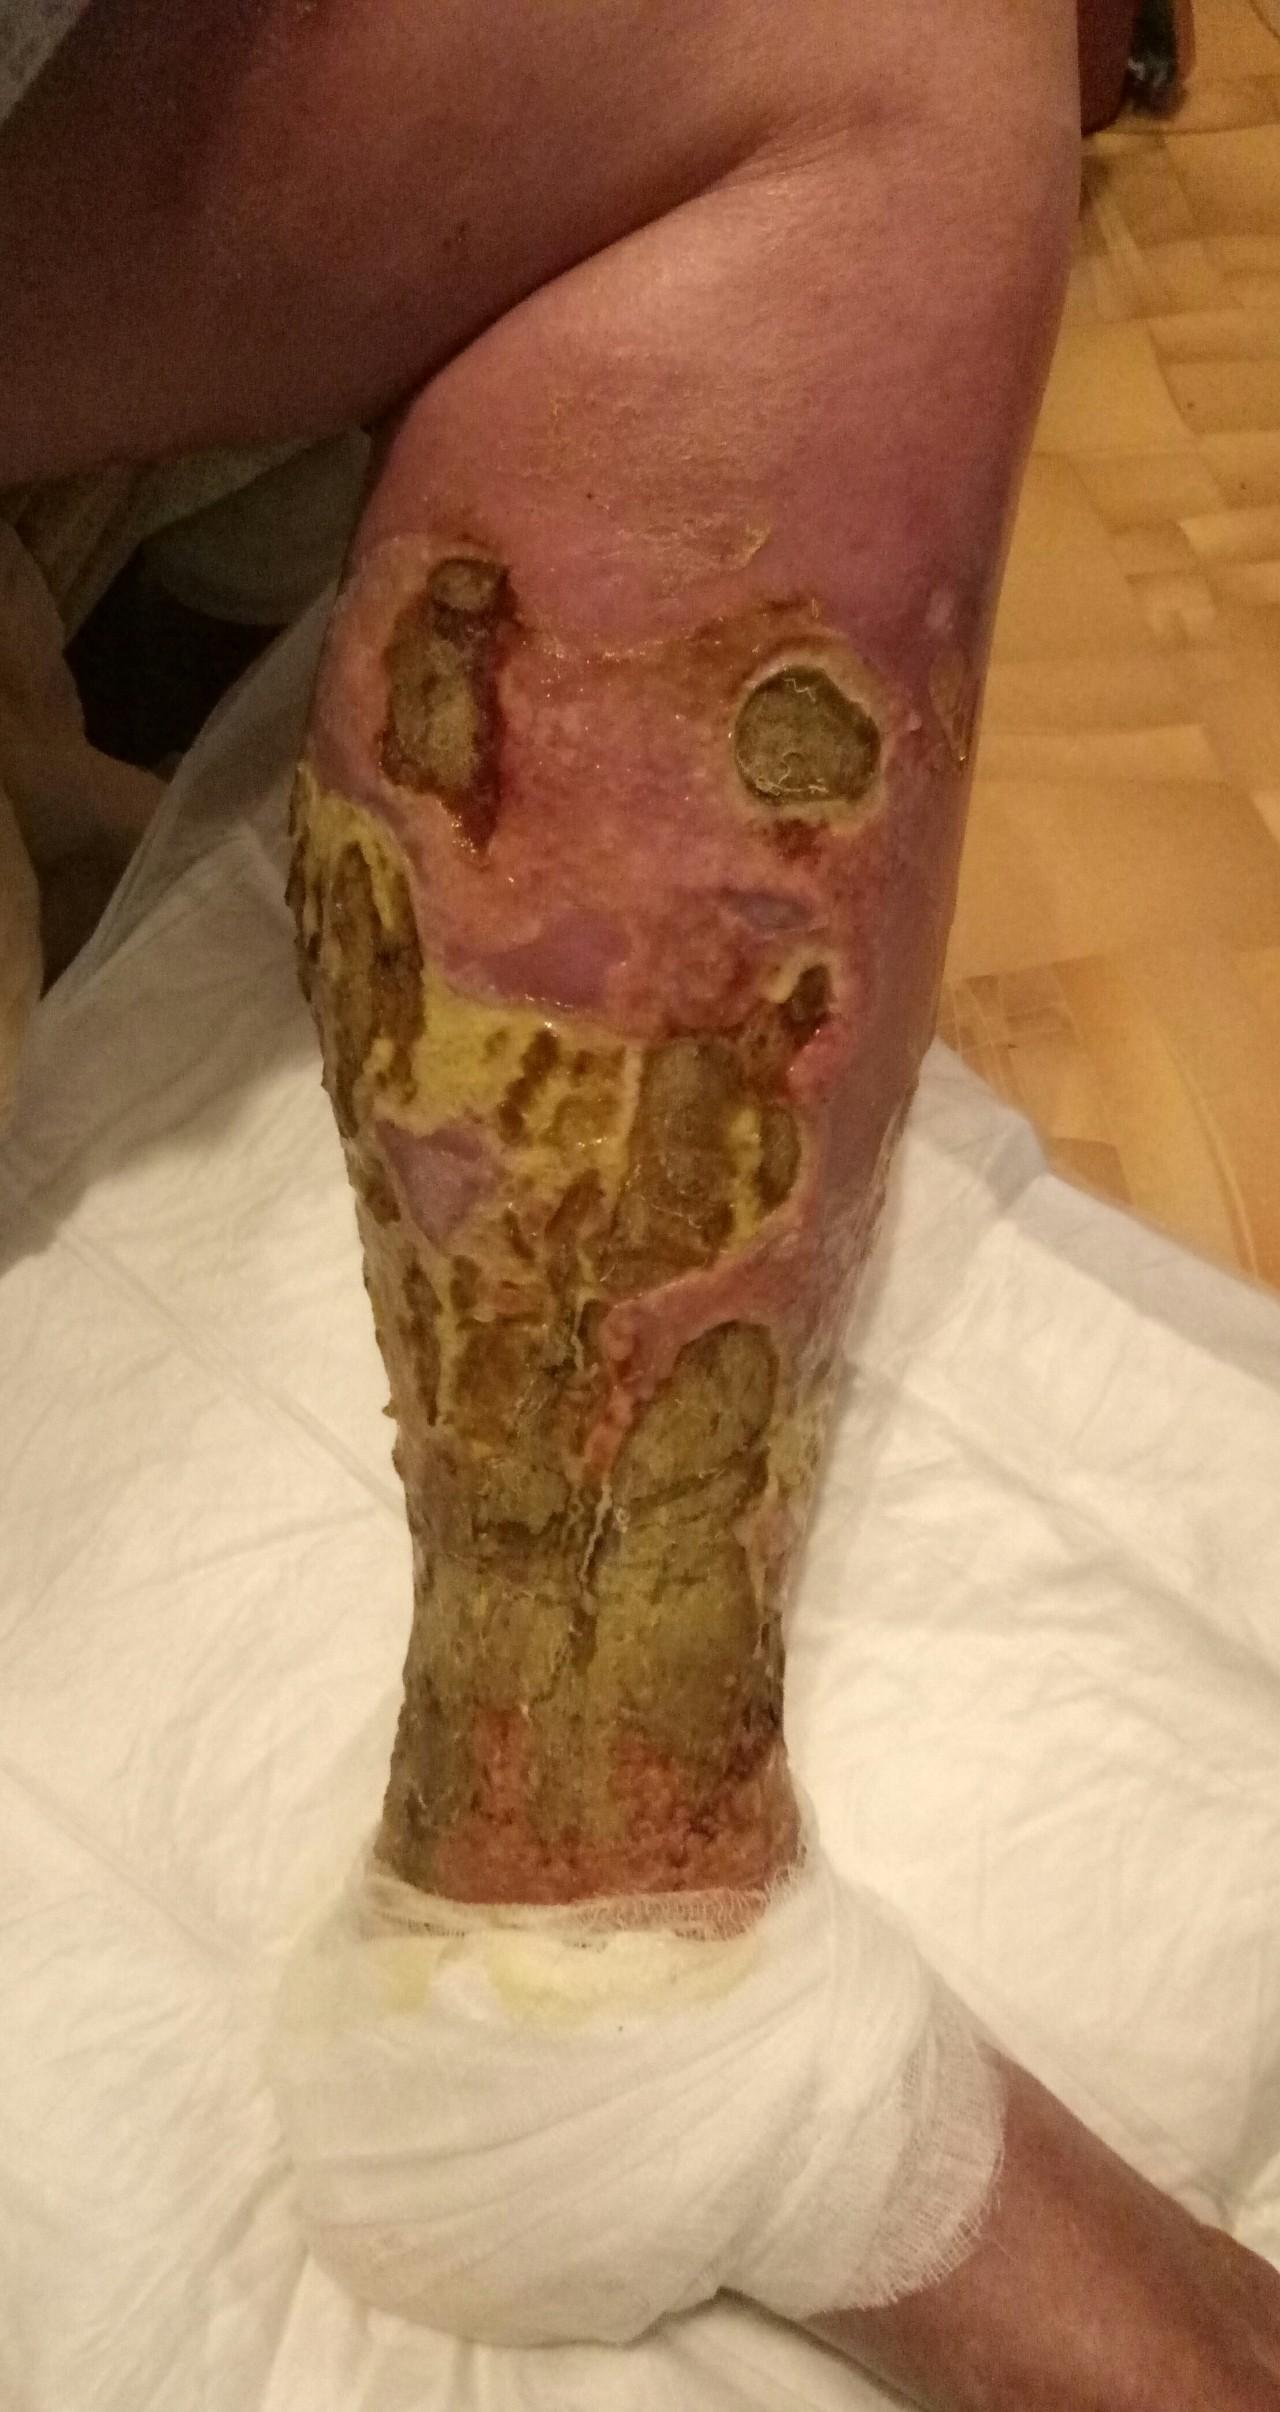 Язва на ногах лечить в домашних условиях